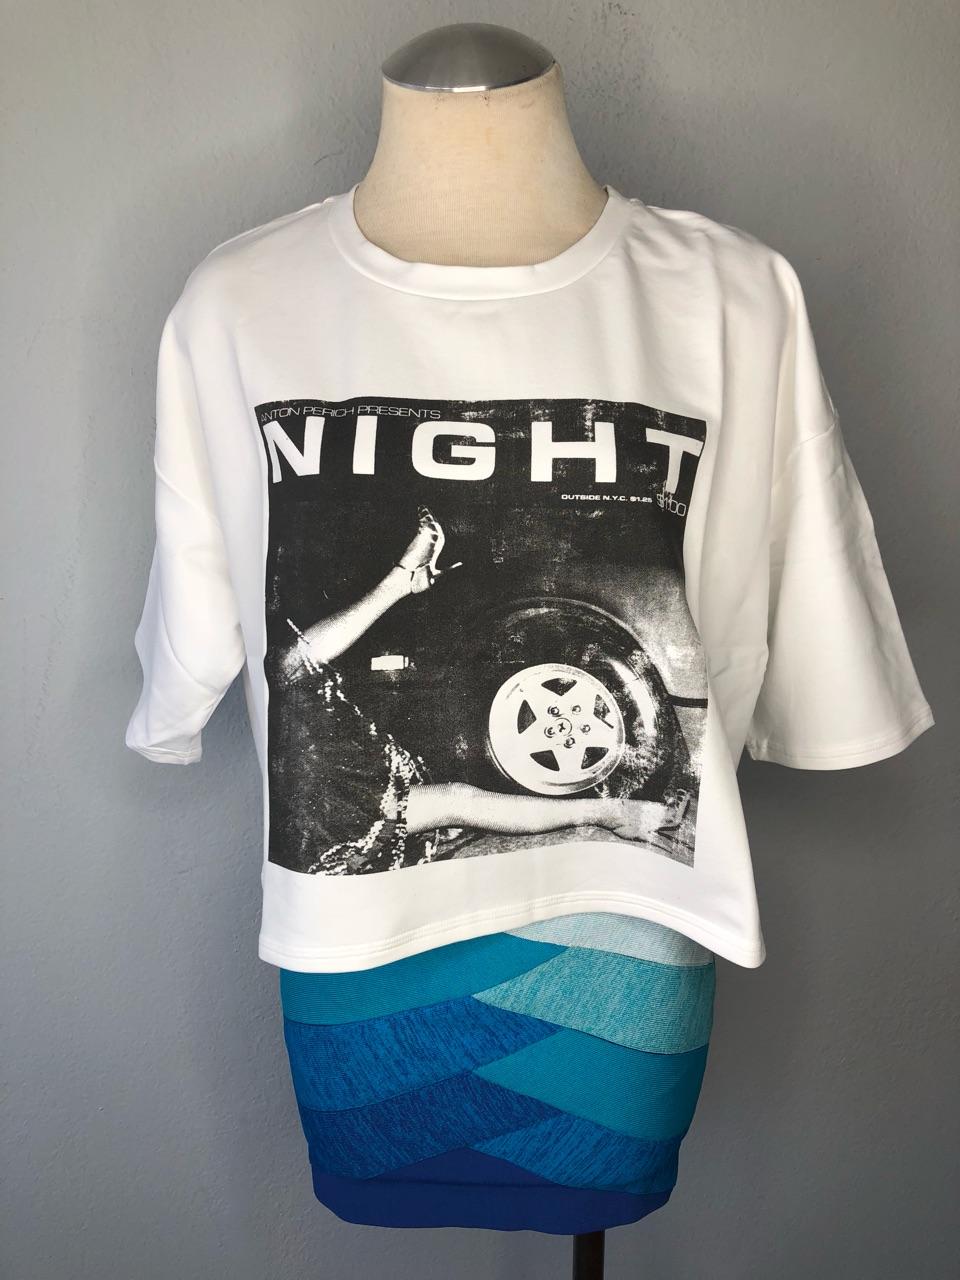 Buy Women's white cotton cropped t-shirt